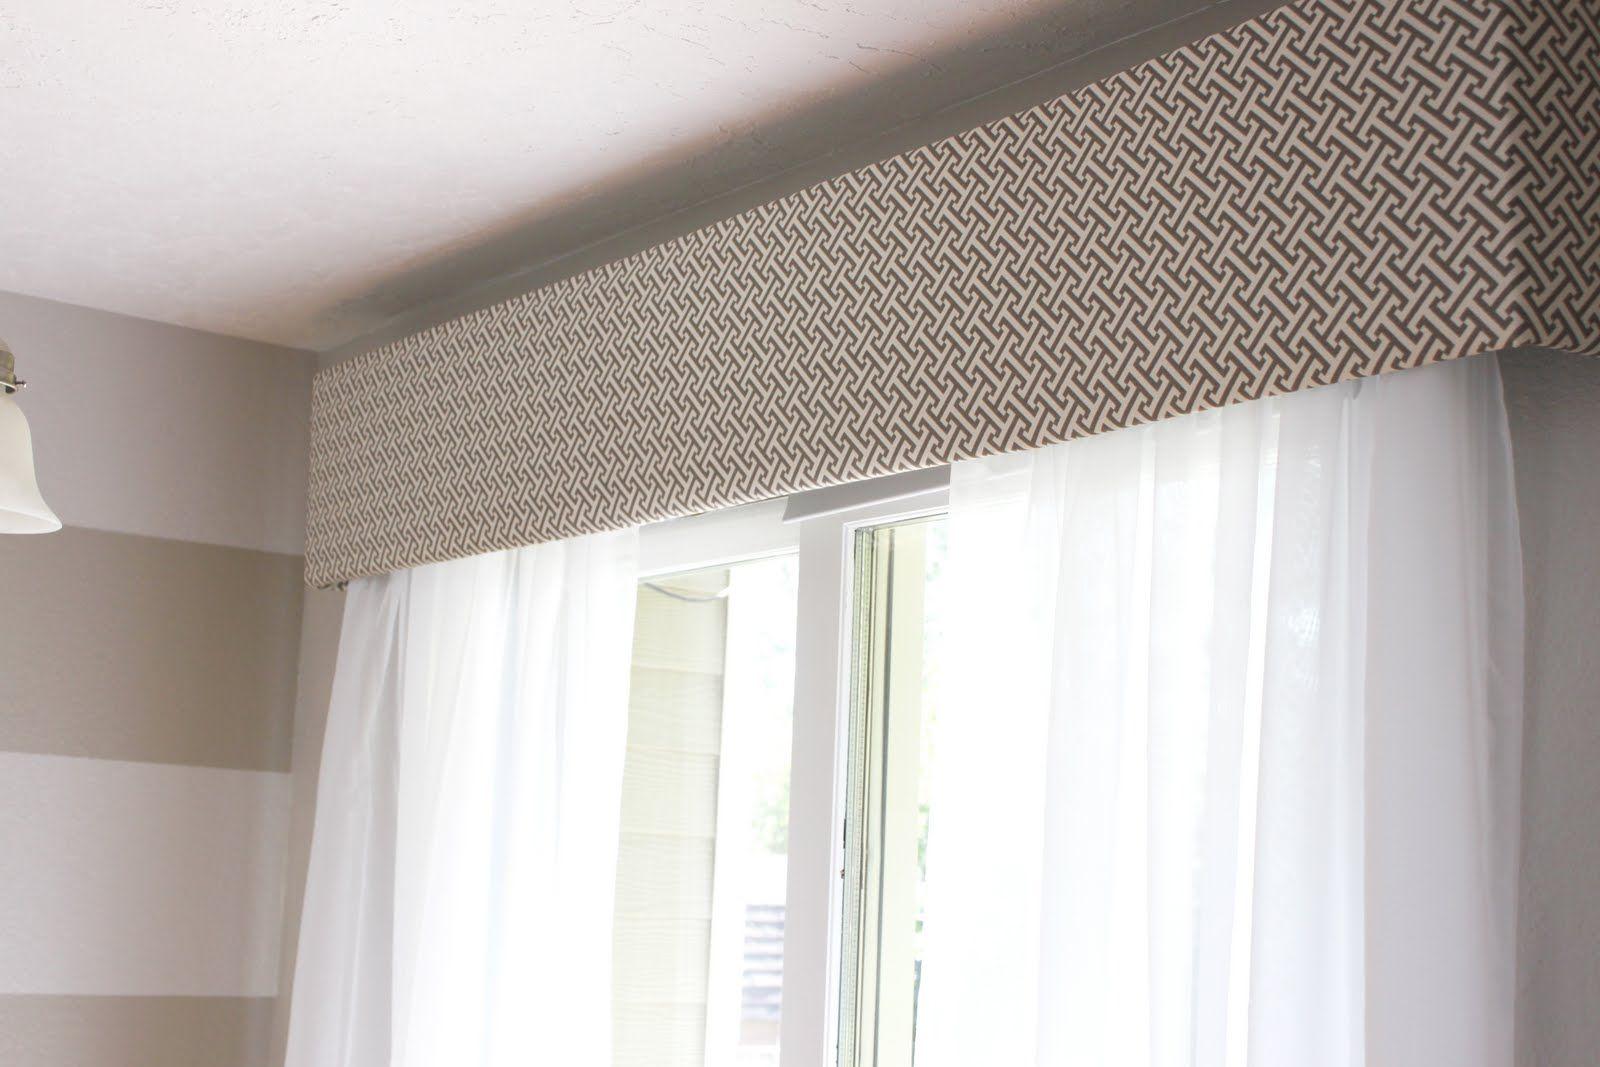 Cornice Window Treatments